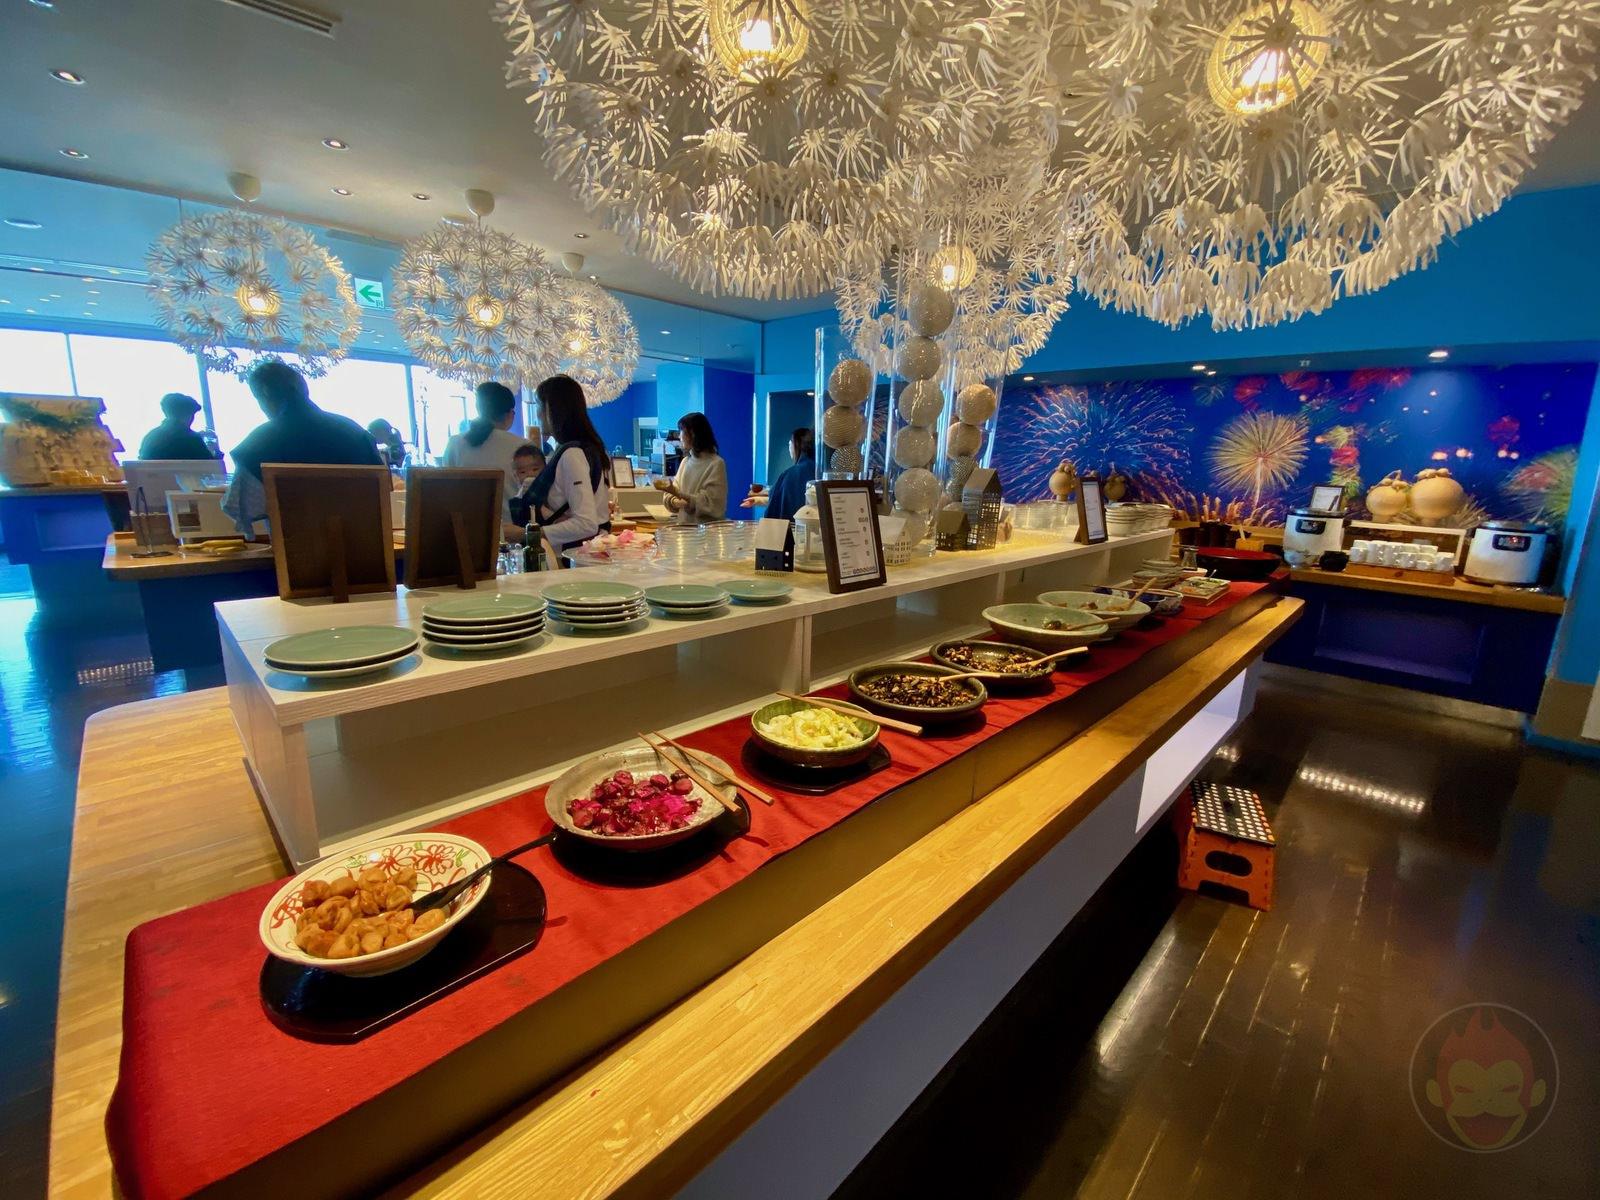 Hoshino Resonale Atami Morning Buffet 09